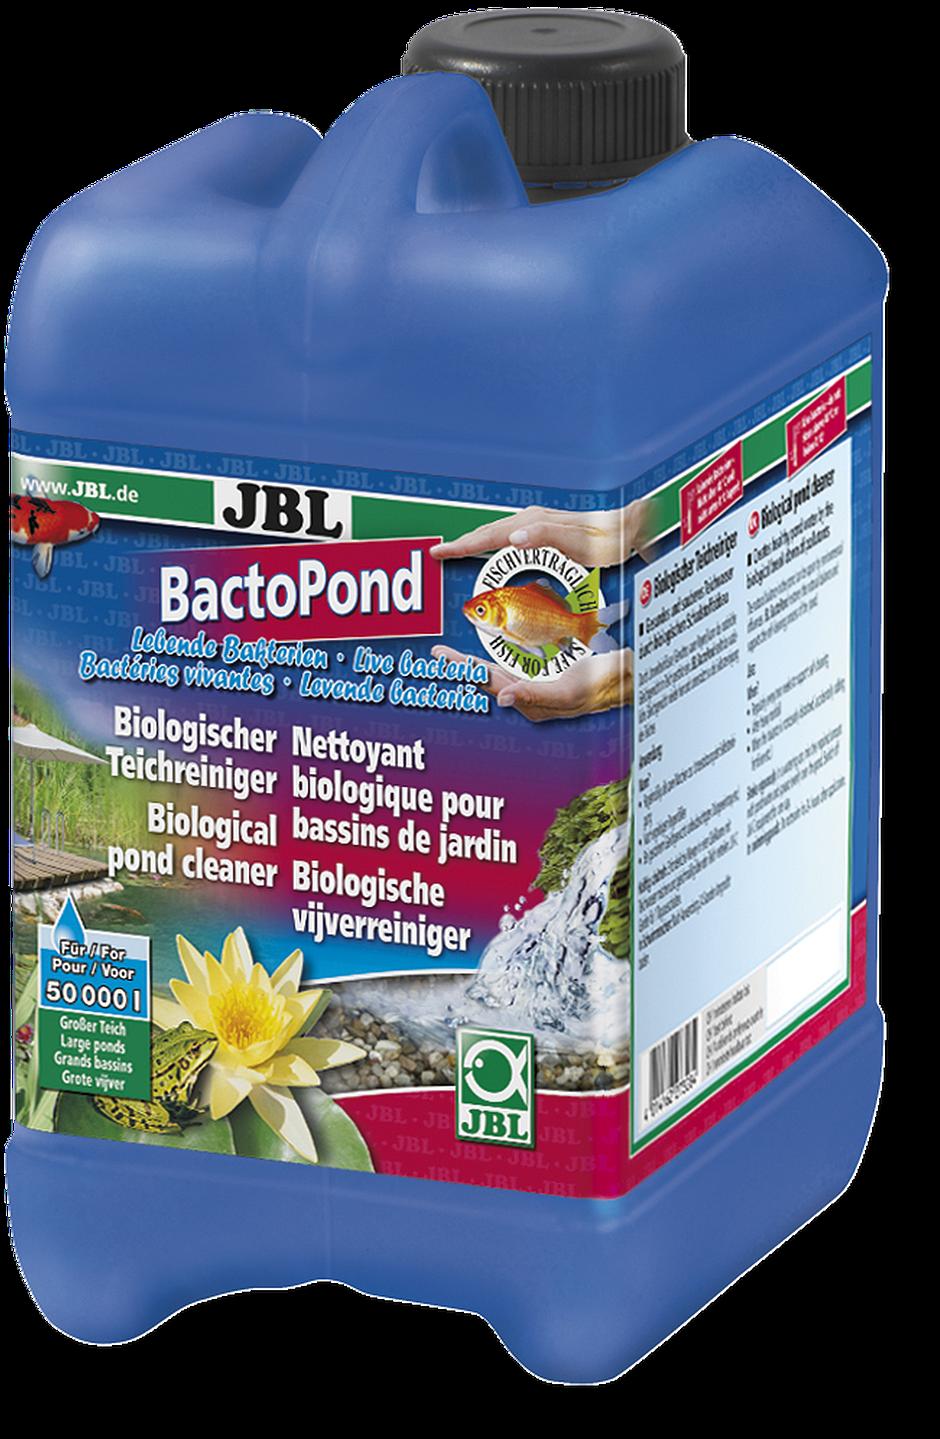 JBL BactoPond 2,5 l